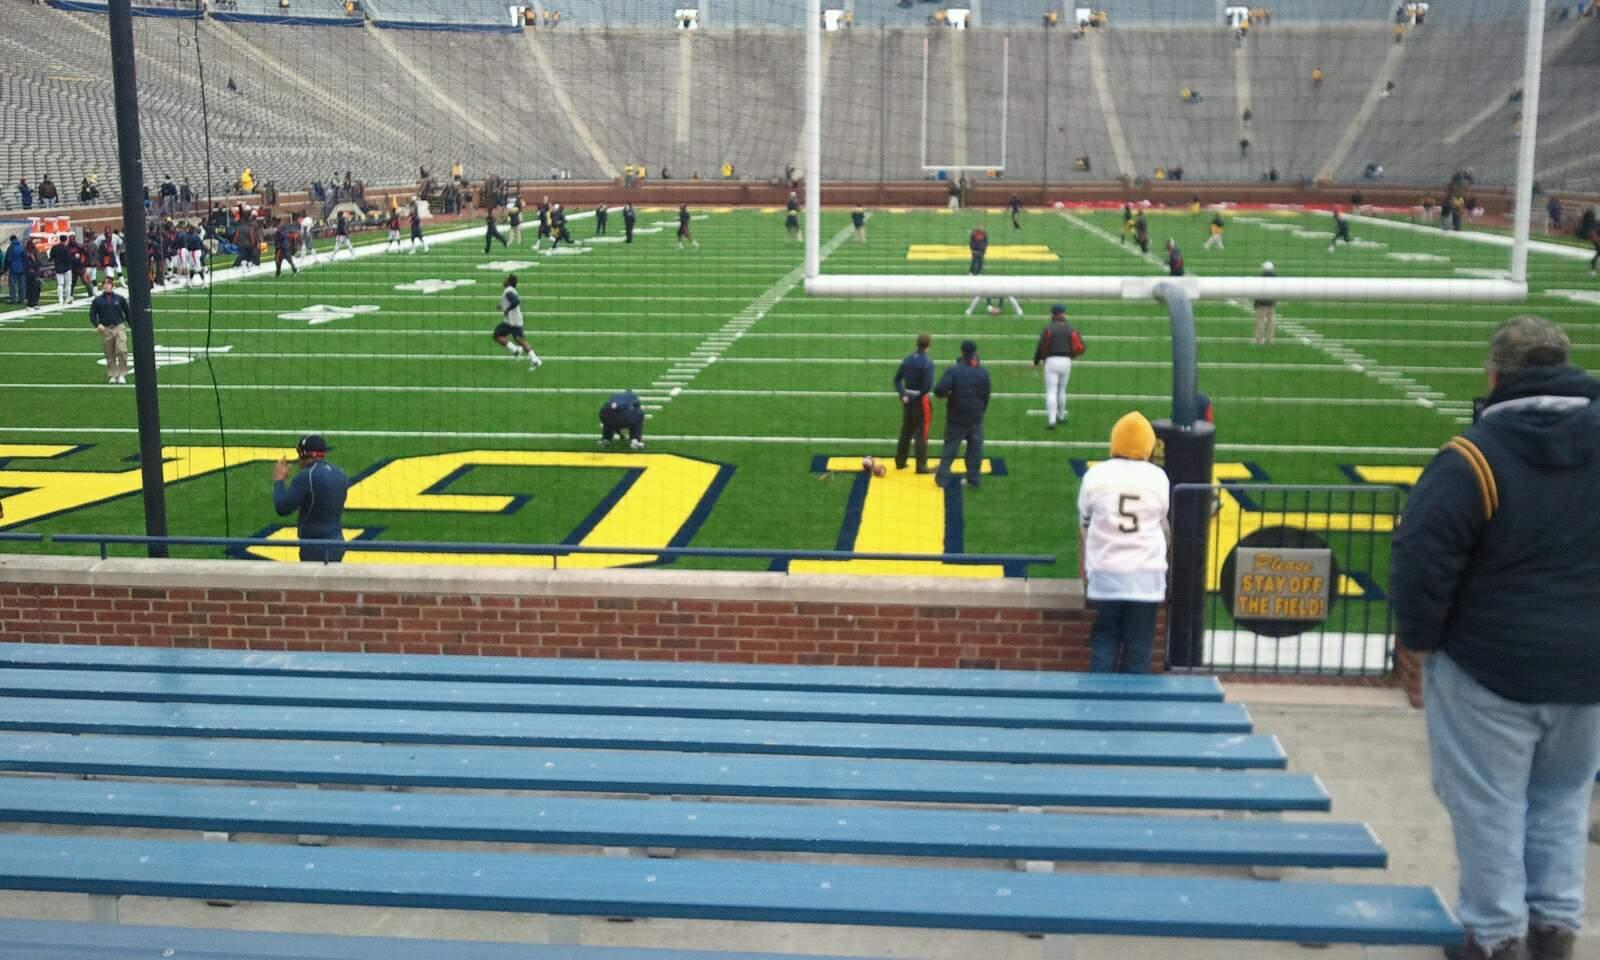 Michigan Stadium Section 12 Row 12 Seat 10